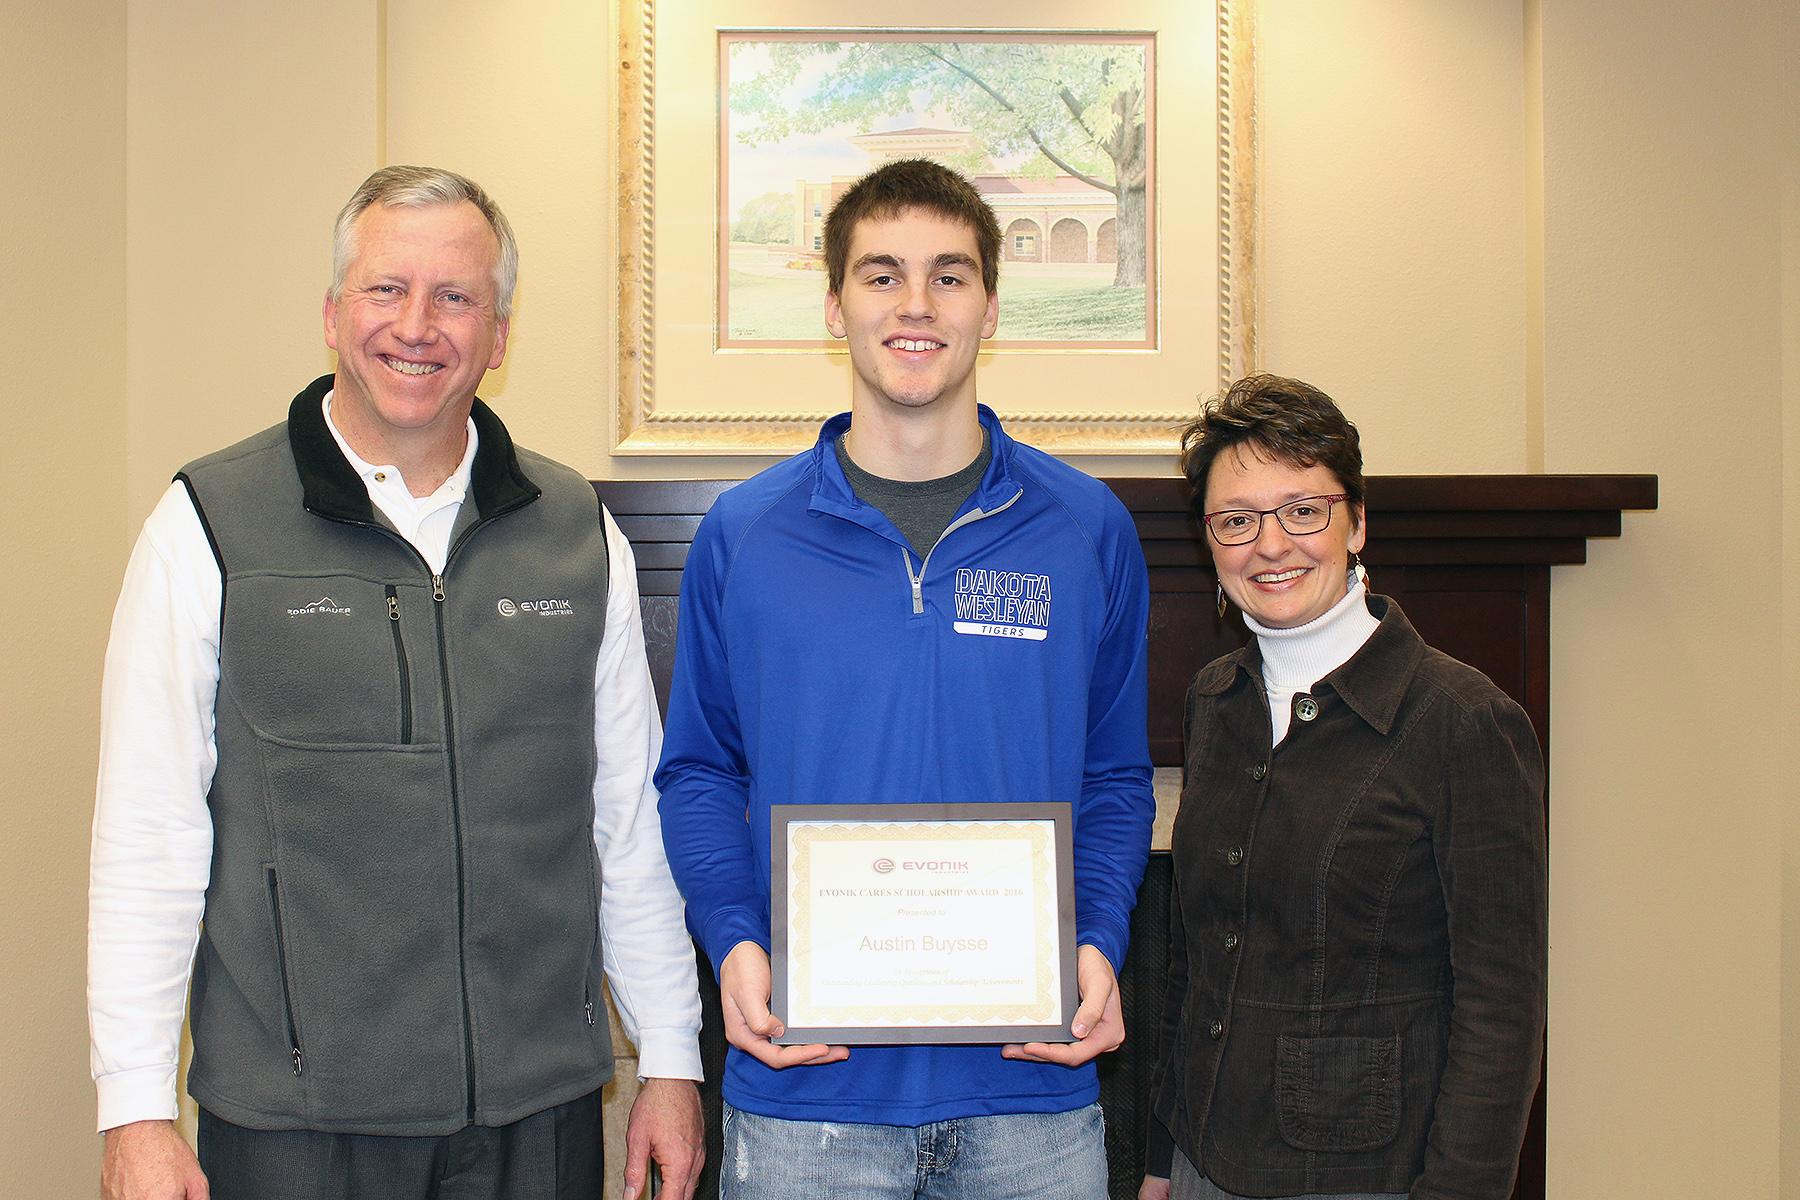 DWU sophomore Austin Buysse granted Evonik Cares Scholarship